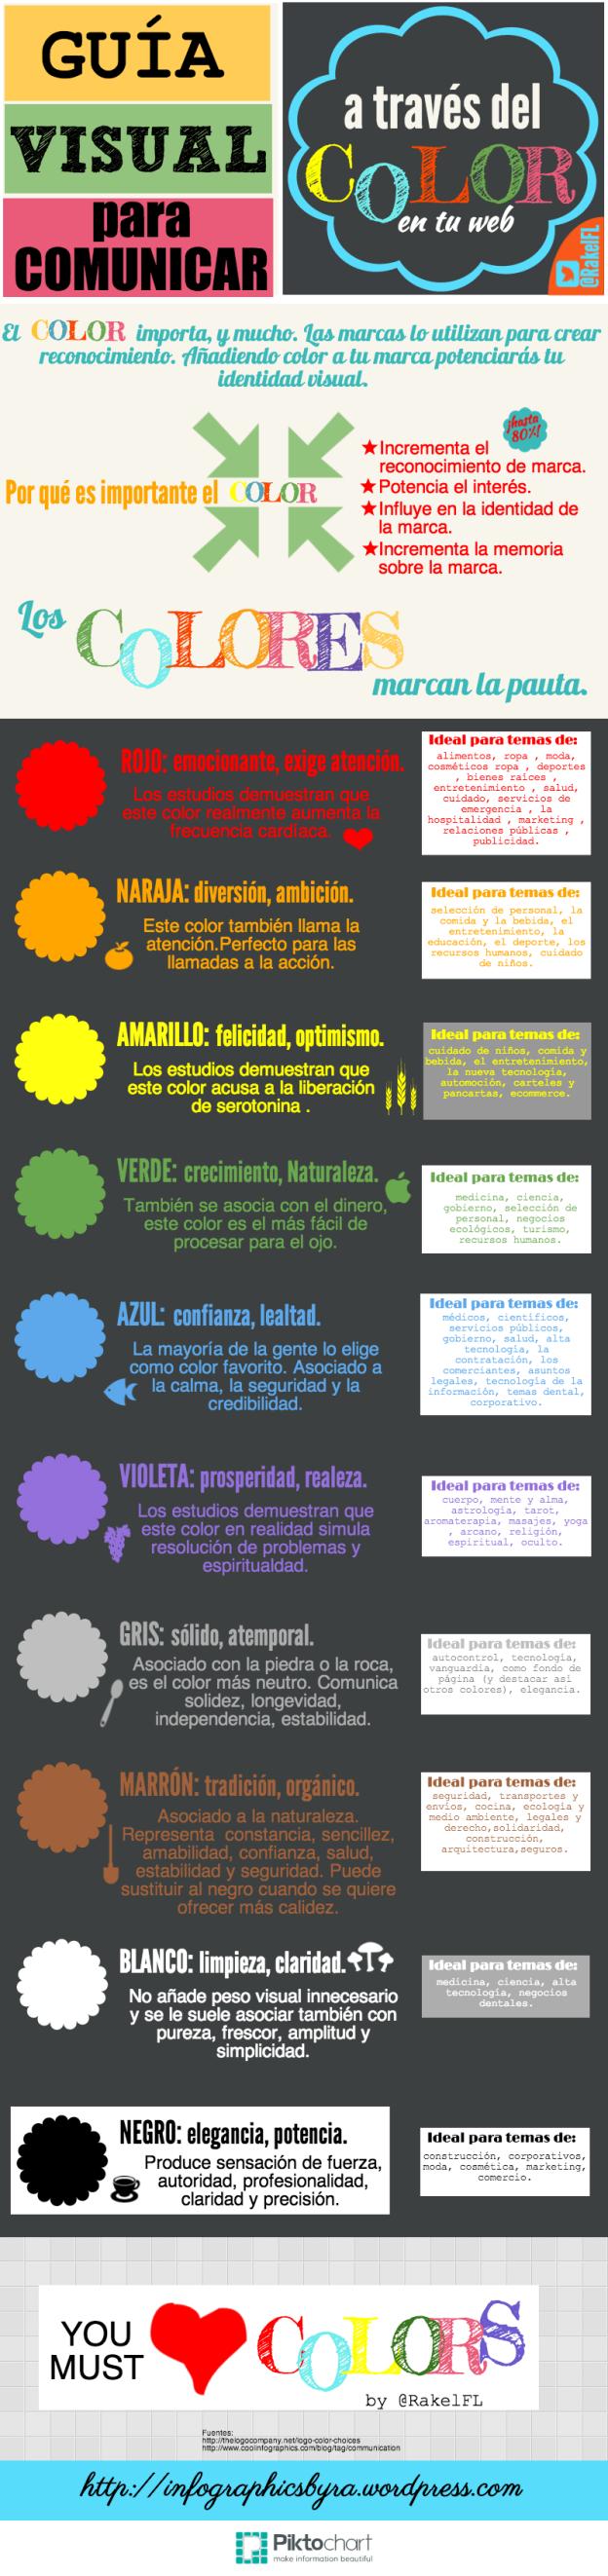 colores-significado-rakel-infografia